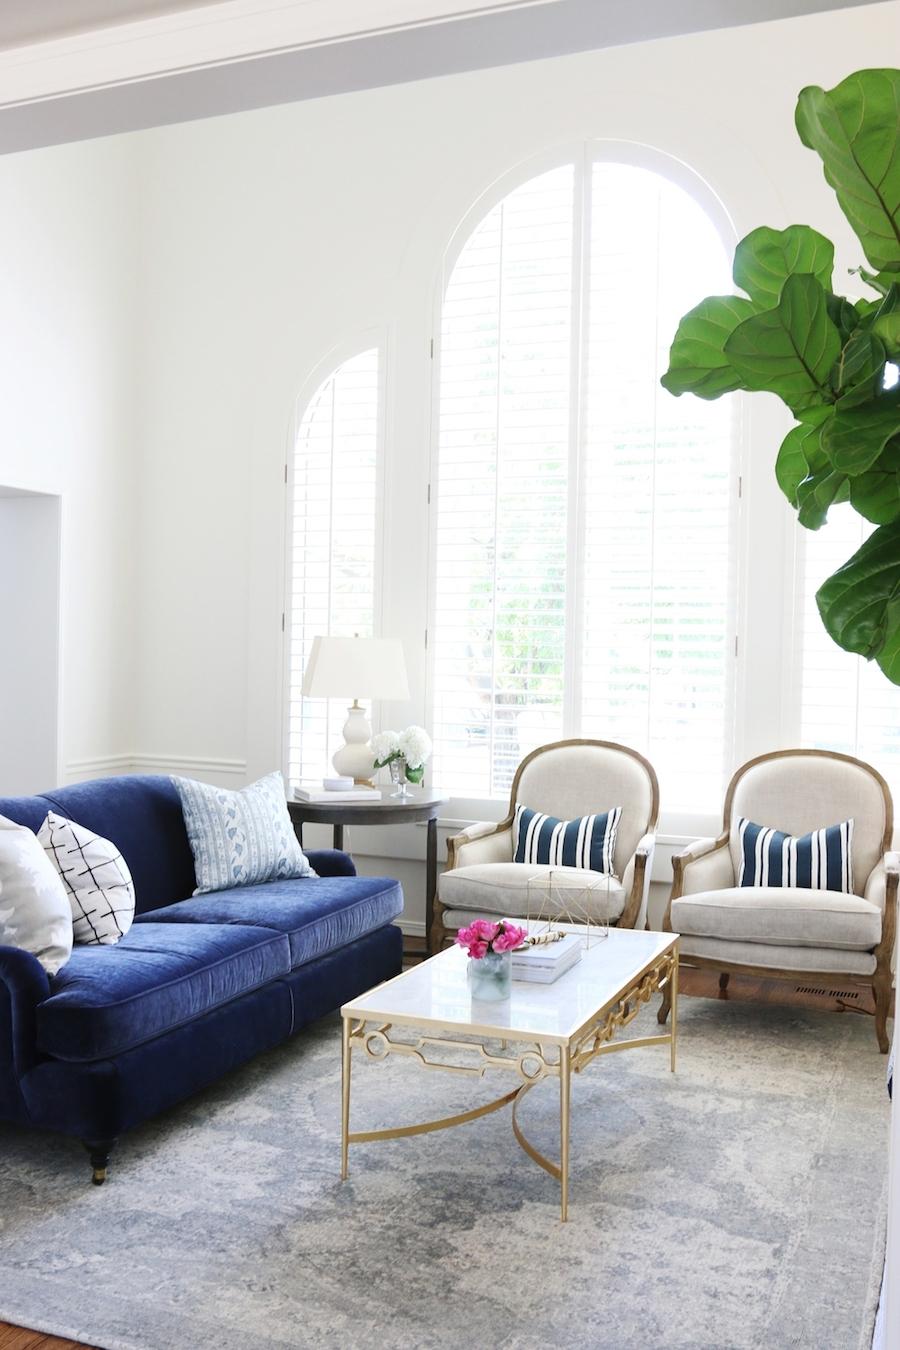 Best And Newest Velvet Sofas Intended For 25 Stunning Living Rooms With Blue Velvet Sofas (View 17 of 20)